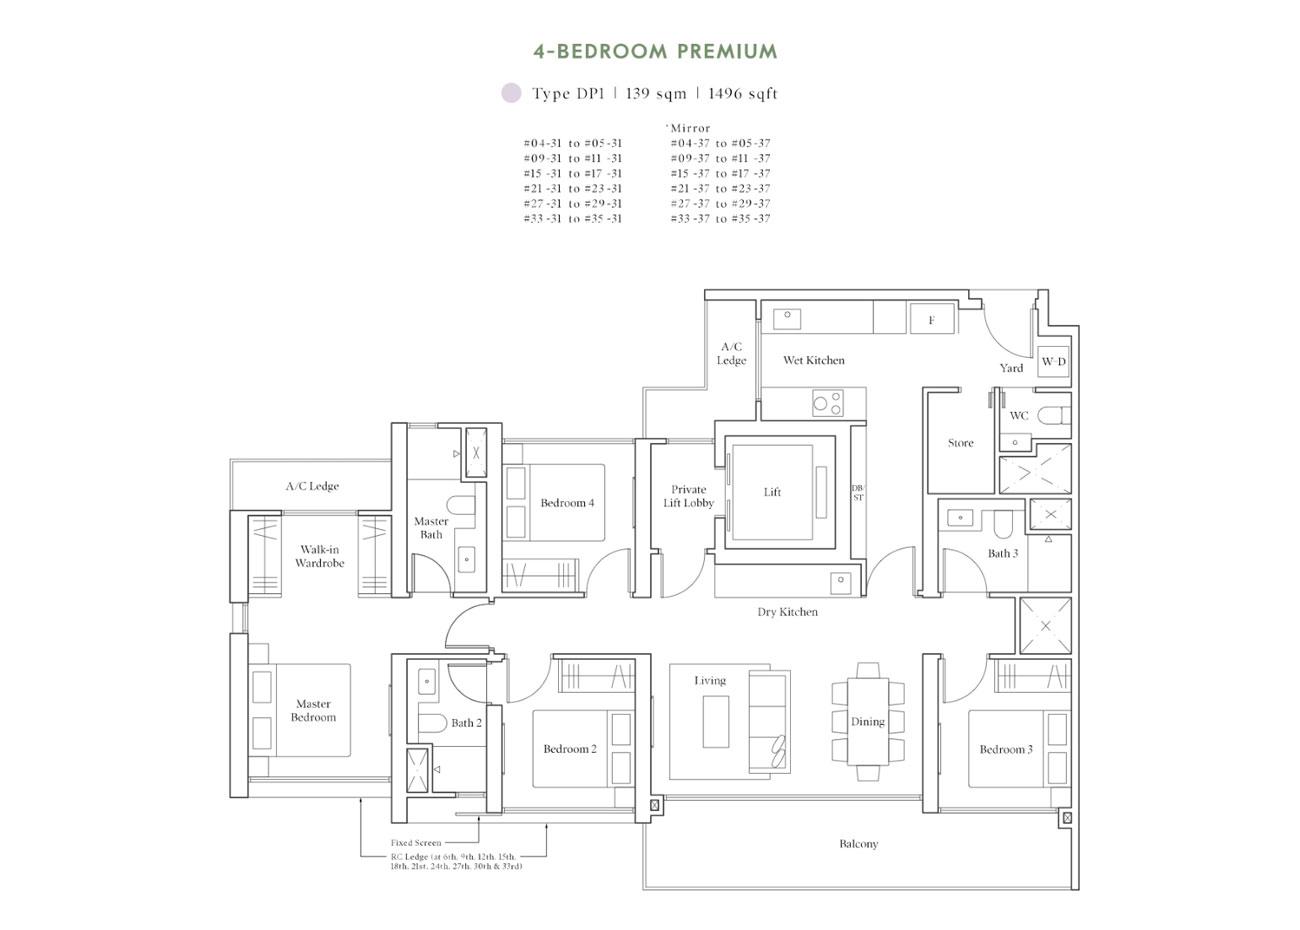 Horizon Collection - 4 Bedroom Premium, DP1